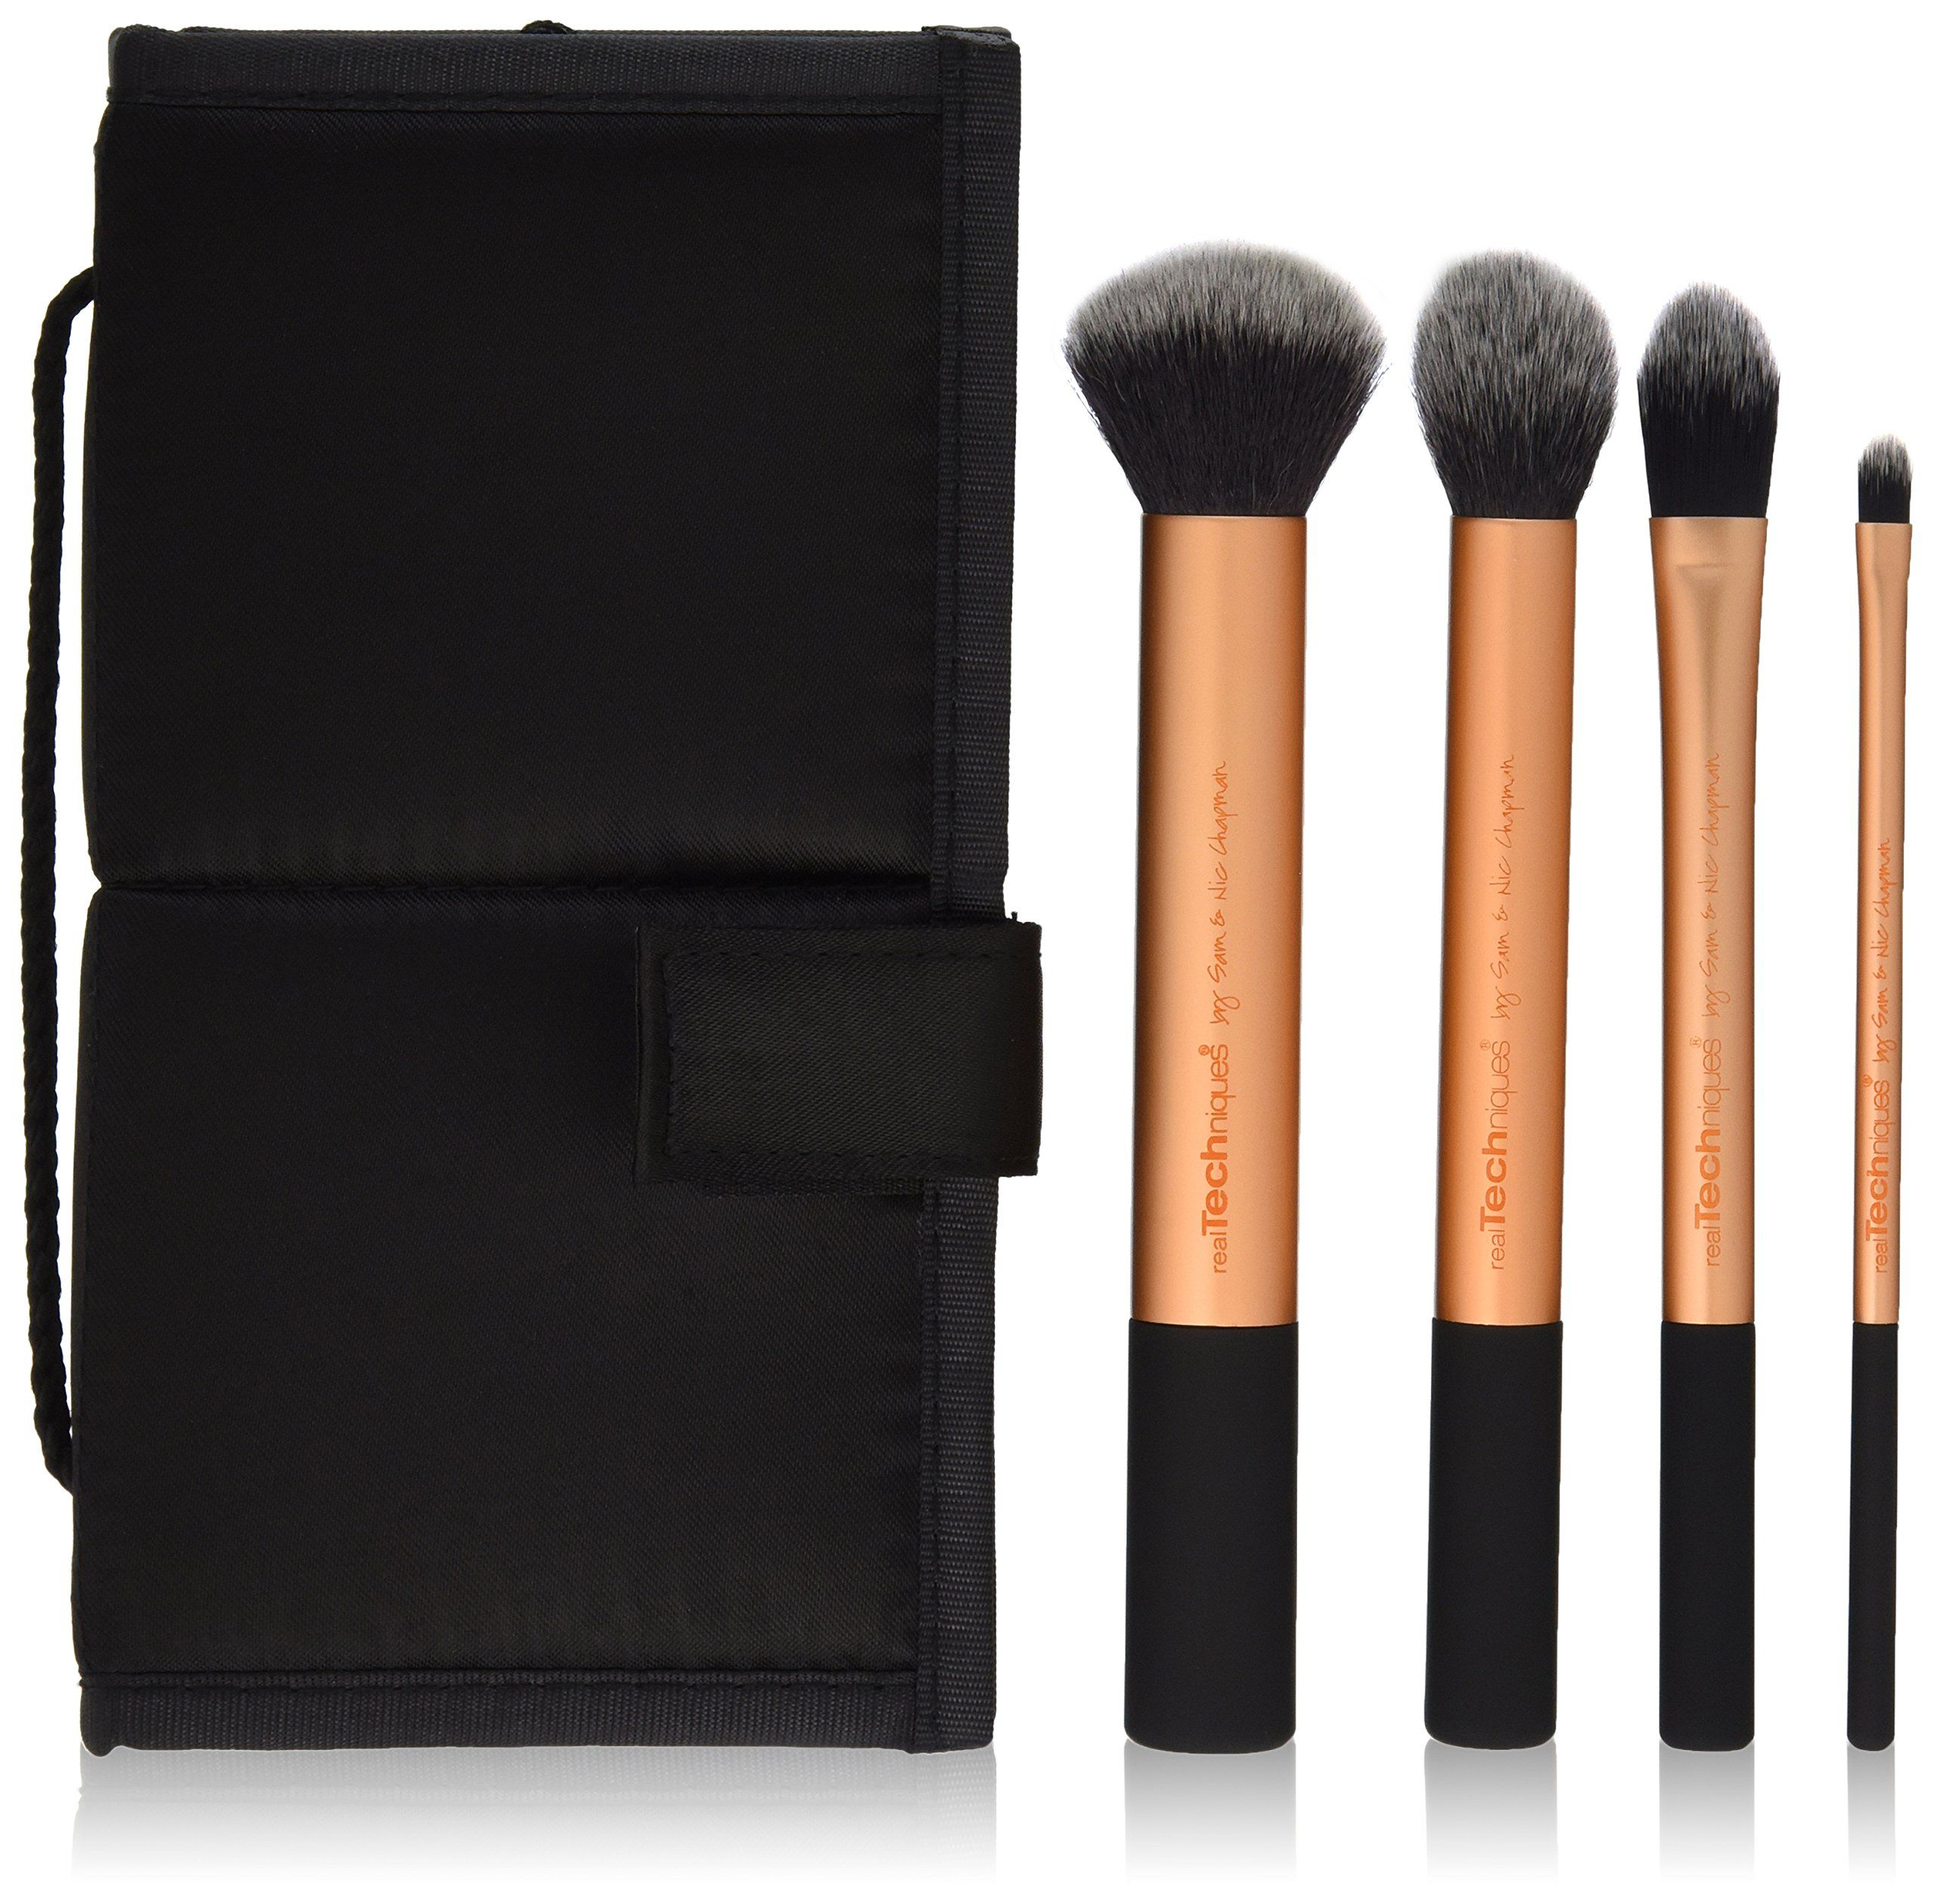 real Techniques Core Collection Set Makeup foundation